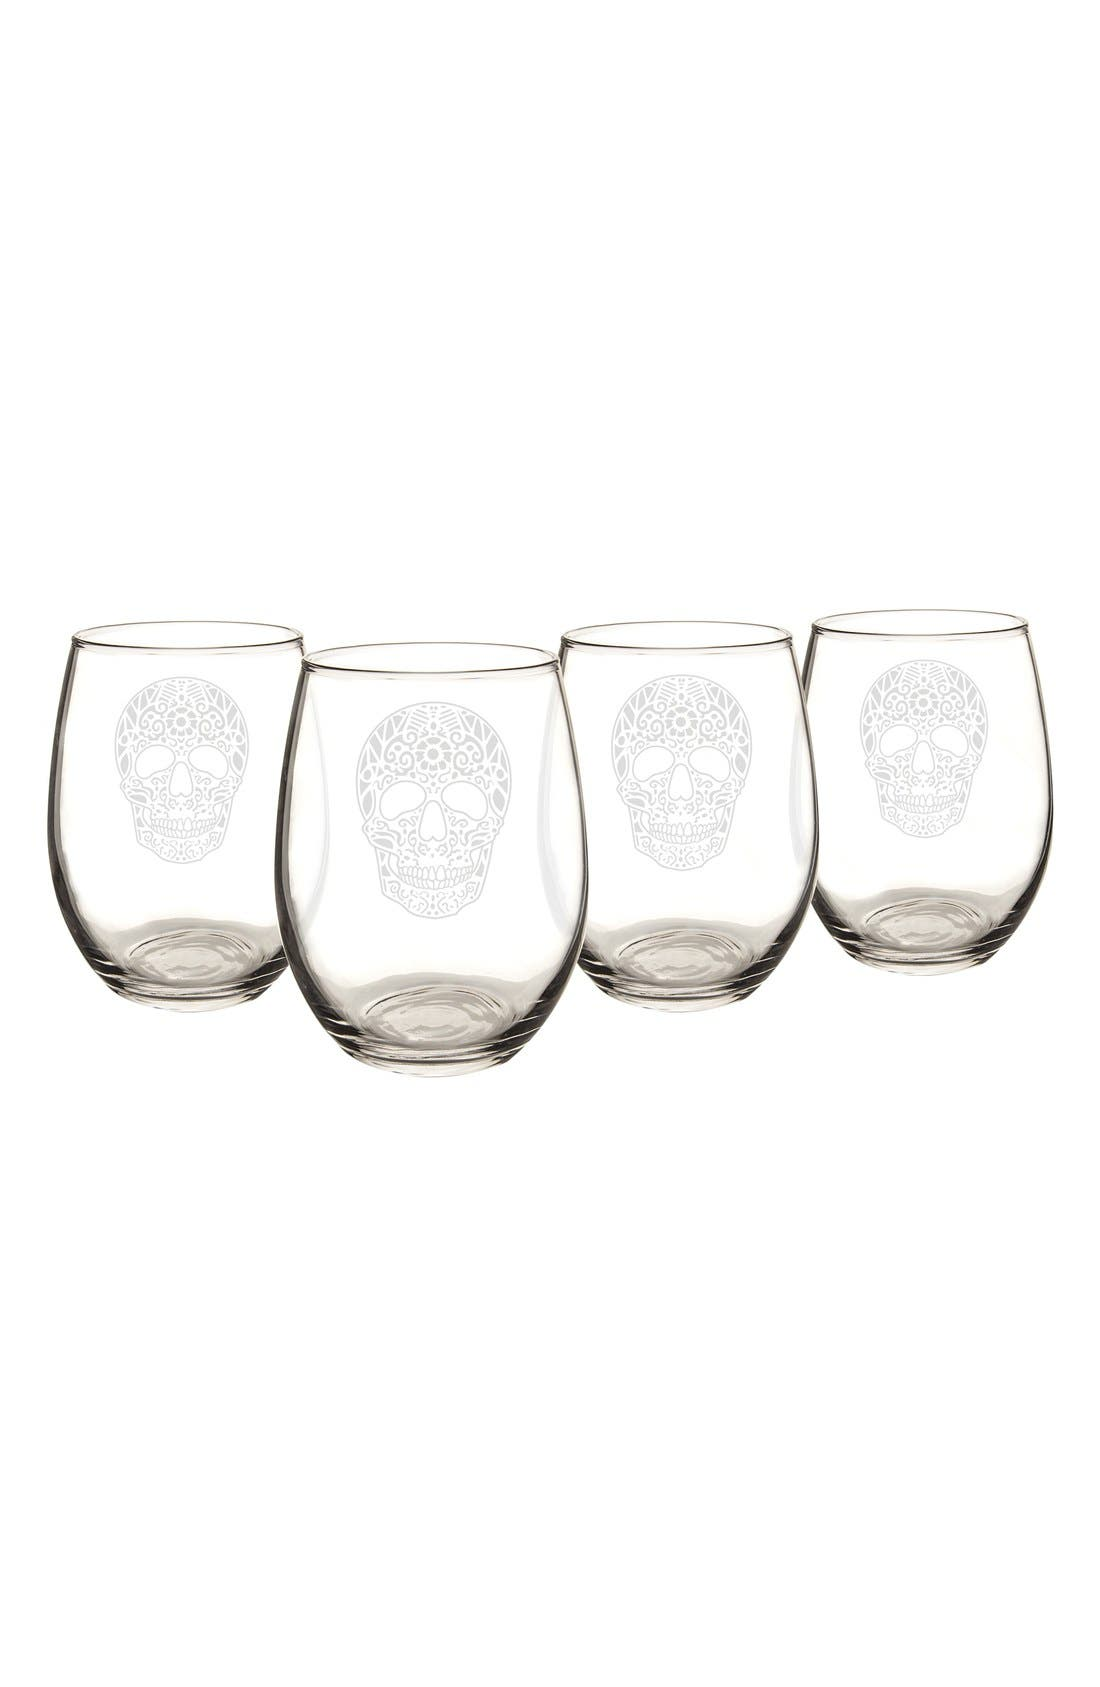 Sugar Skulls Set of 4 Stemless Wine Glasses,                             Main thumbnail 1, color,                             Clear